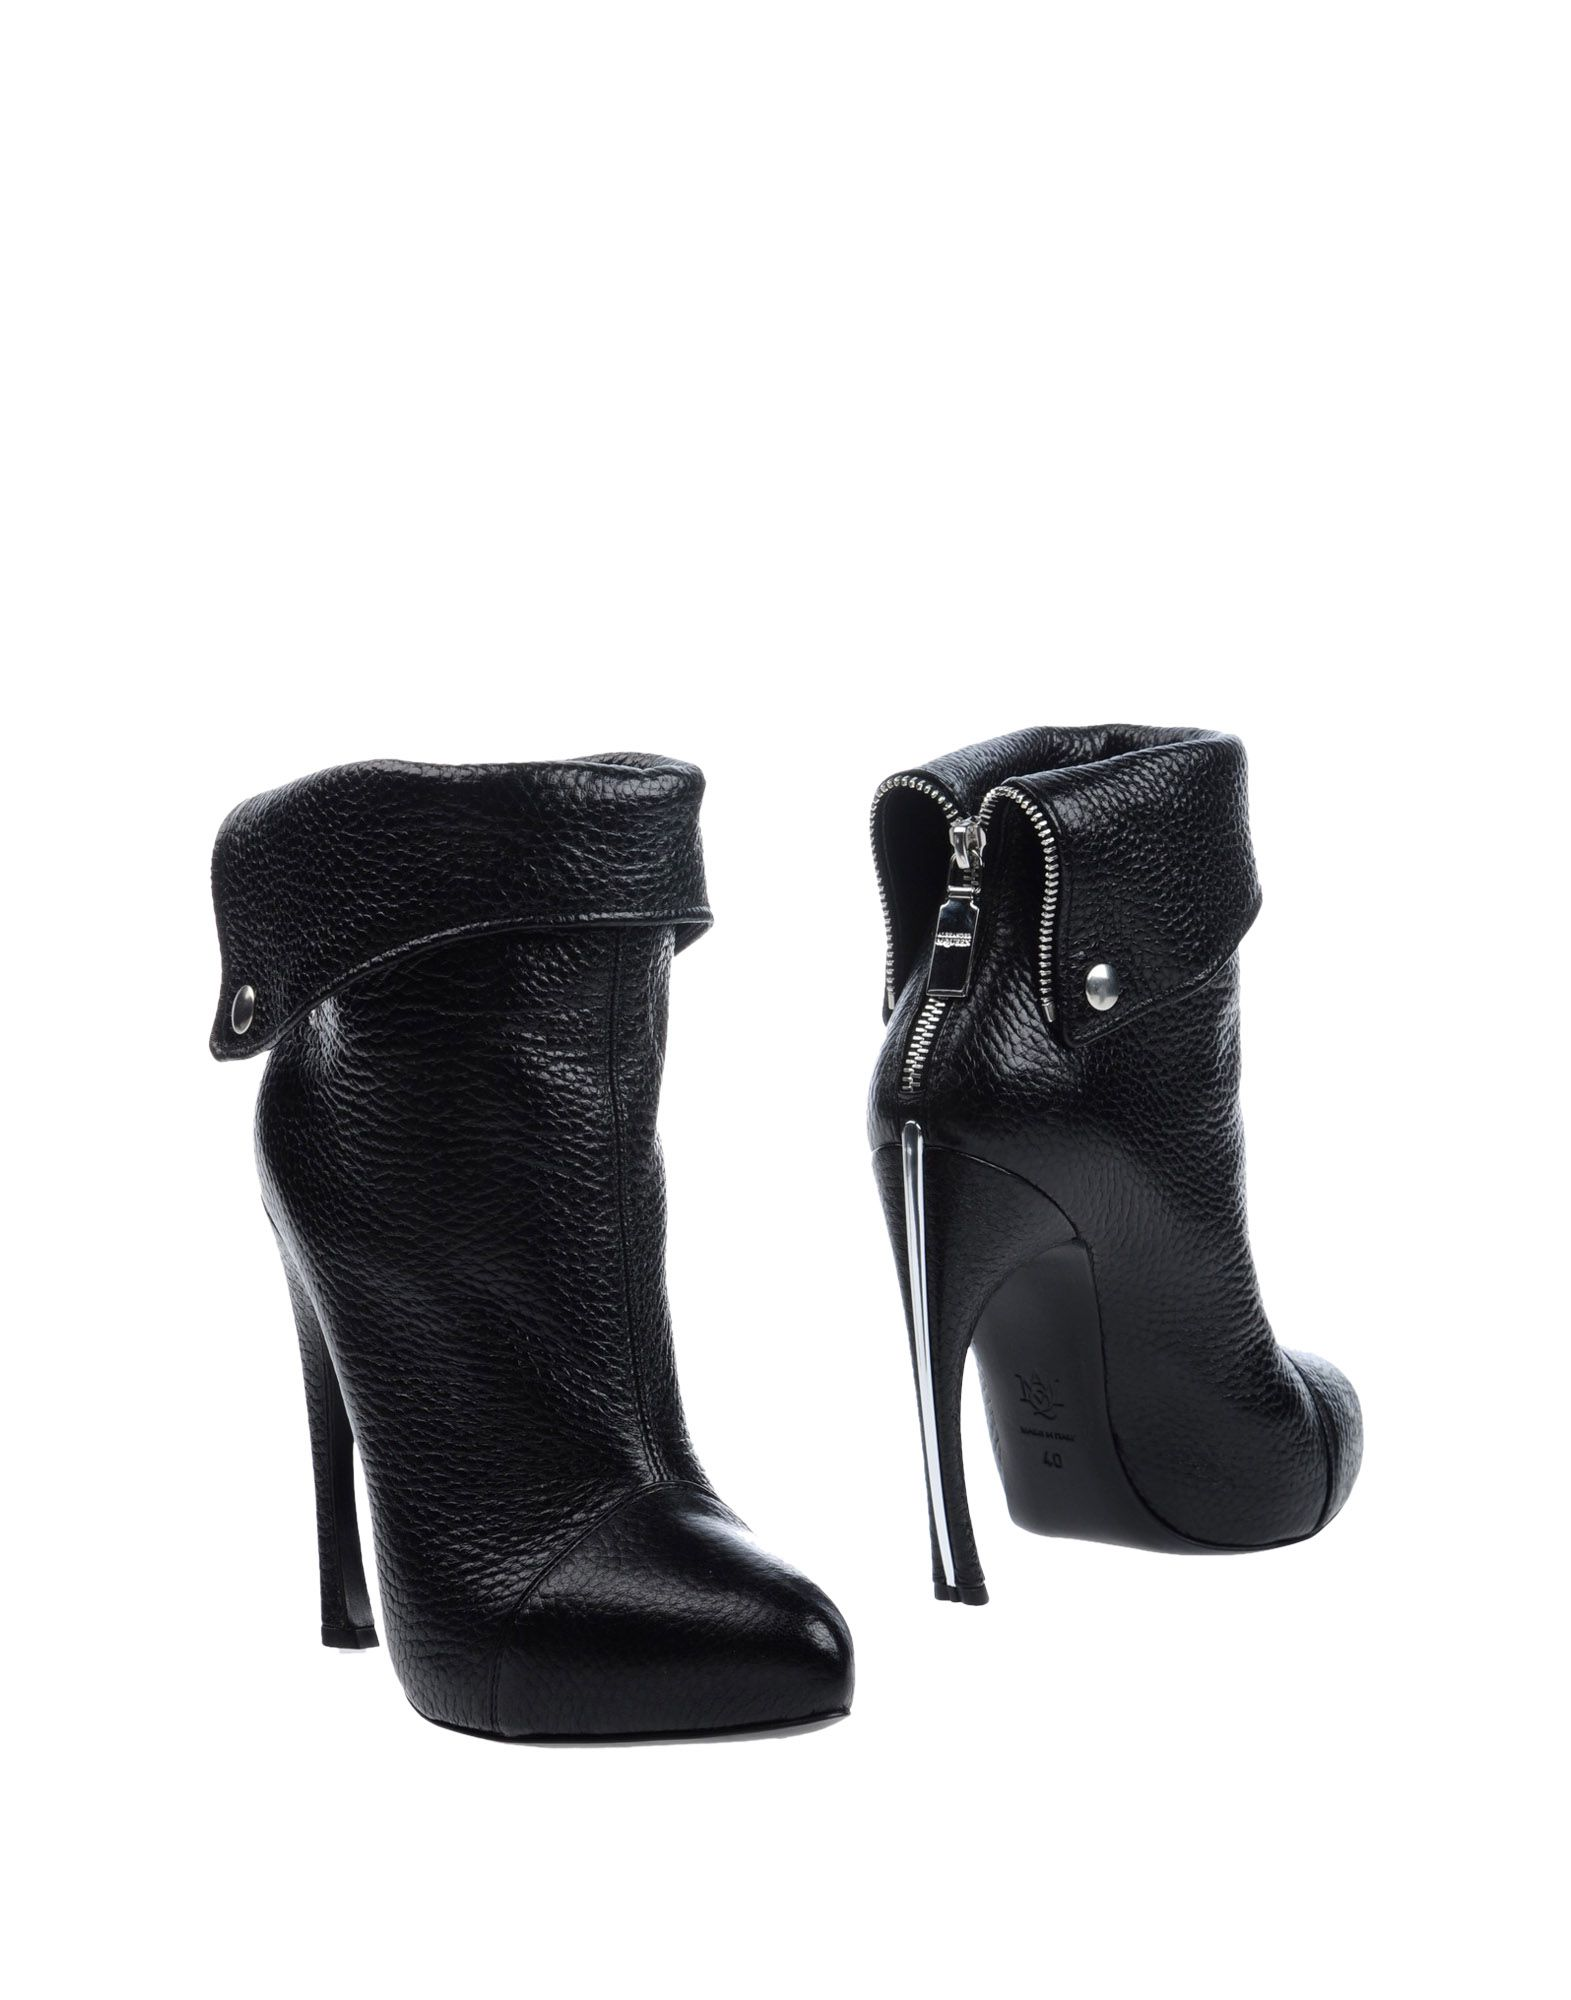 Bottine Alexander Mcqueen Femme - Bottines Alexander Mcqueen Noir Chaussures femme pas cher homme et femme